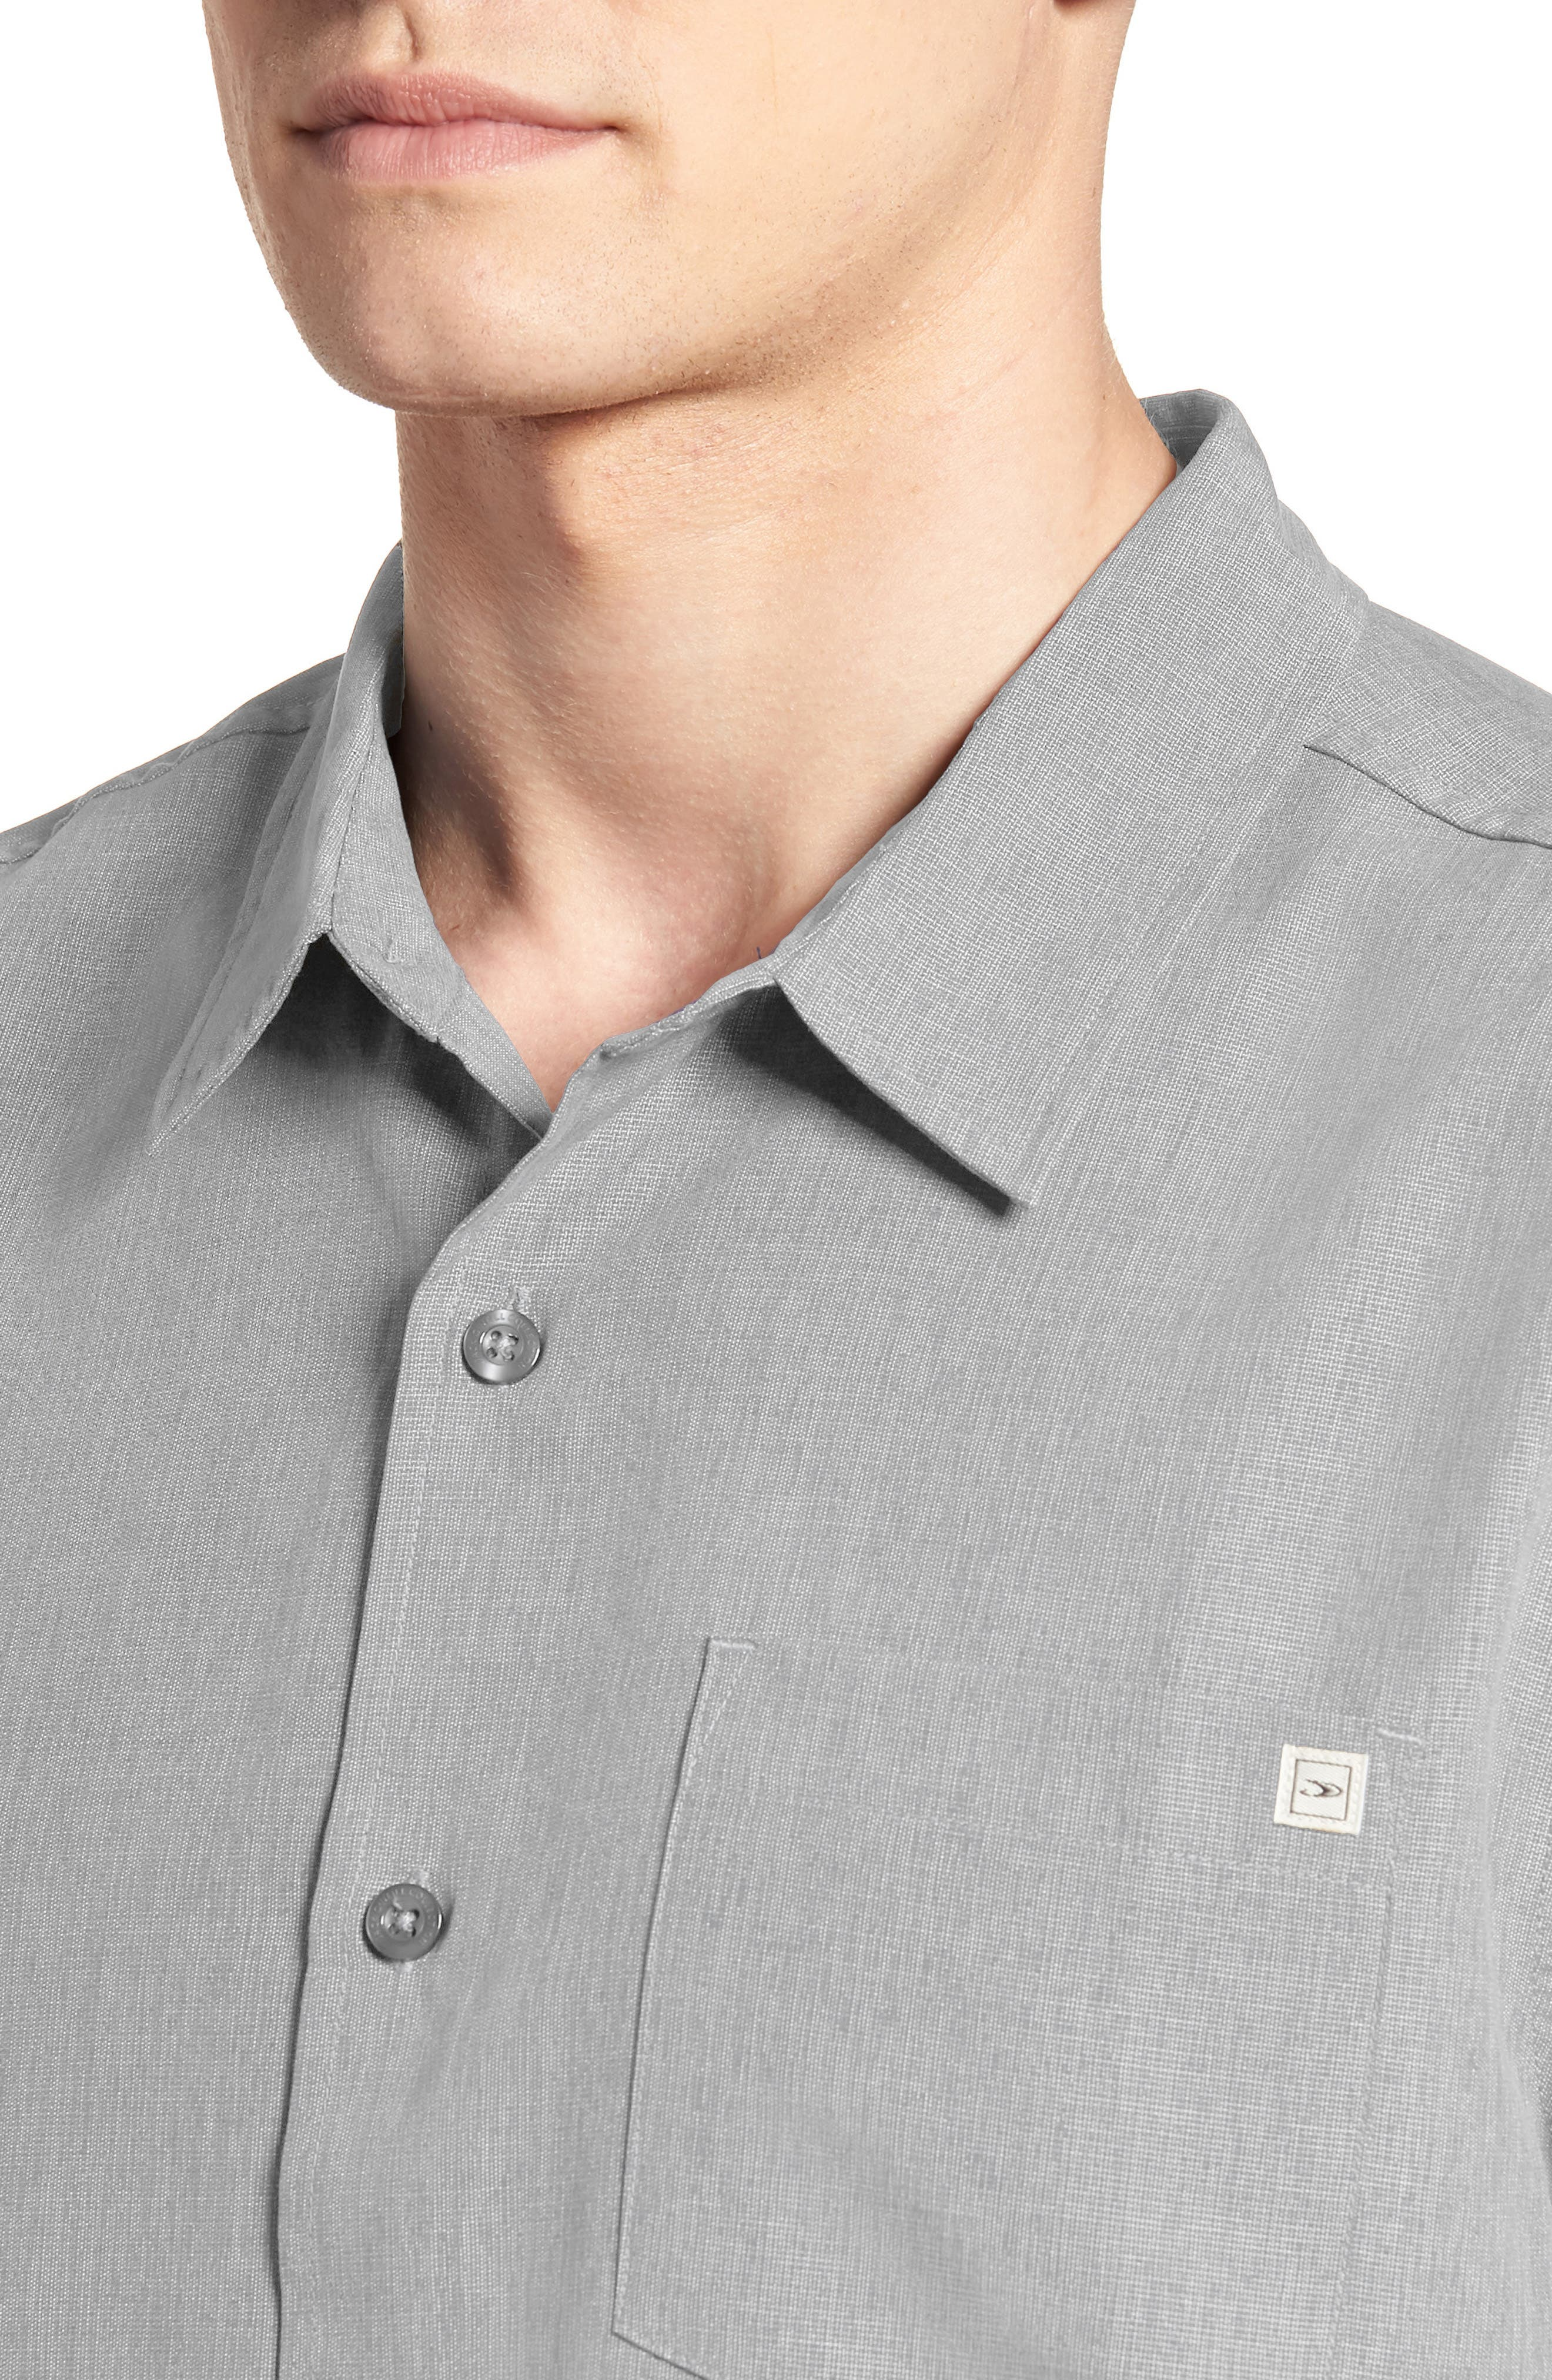 Liberty Regular Fit Short Sleeve Sport Shirt,                             Alternate thumbnail 7, color,                             Light Grey